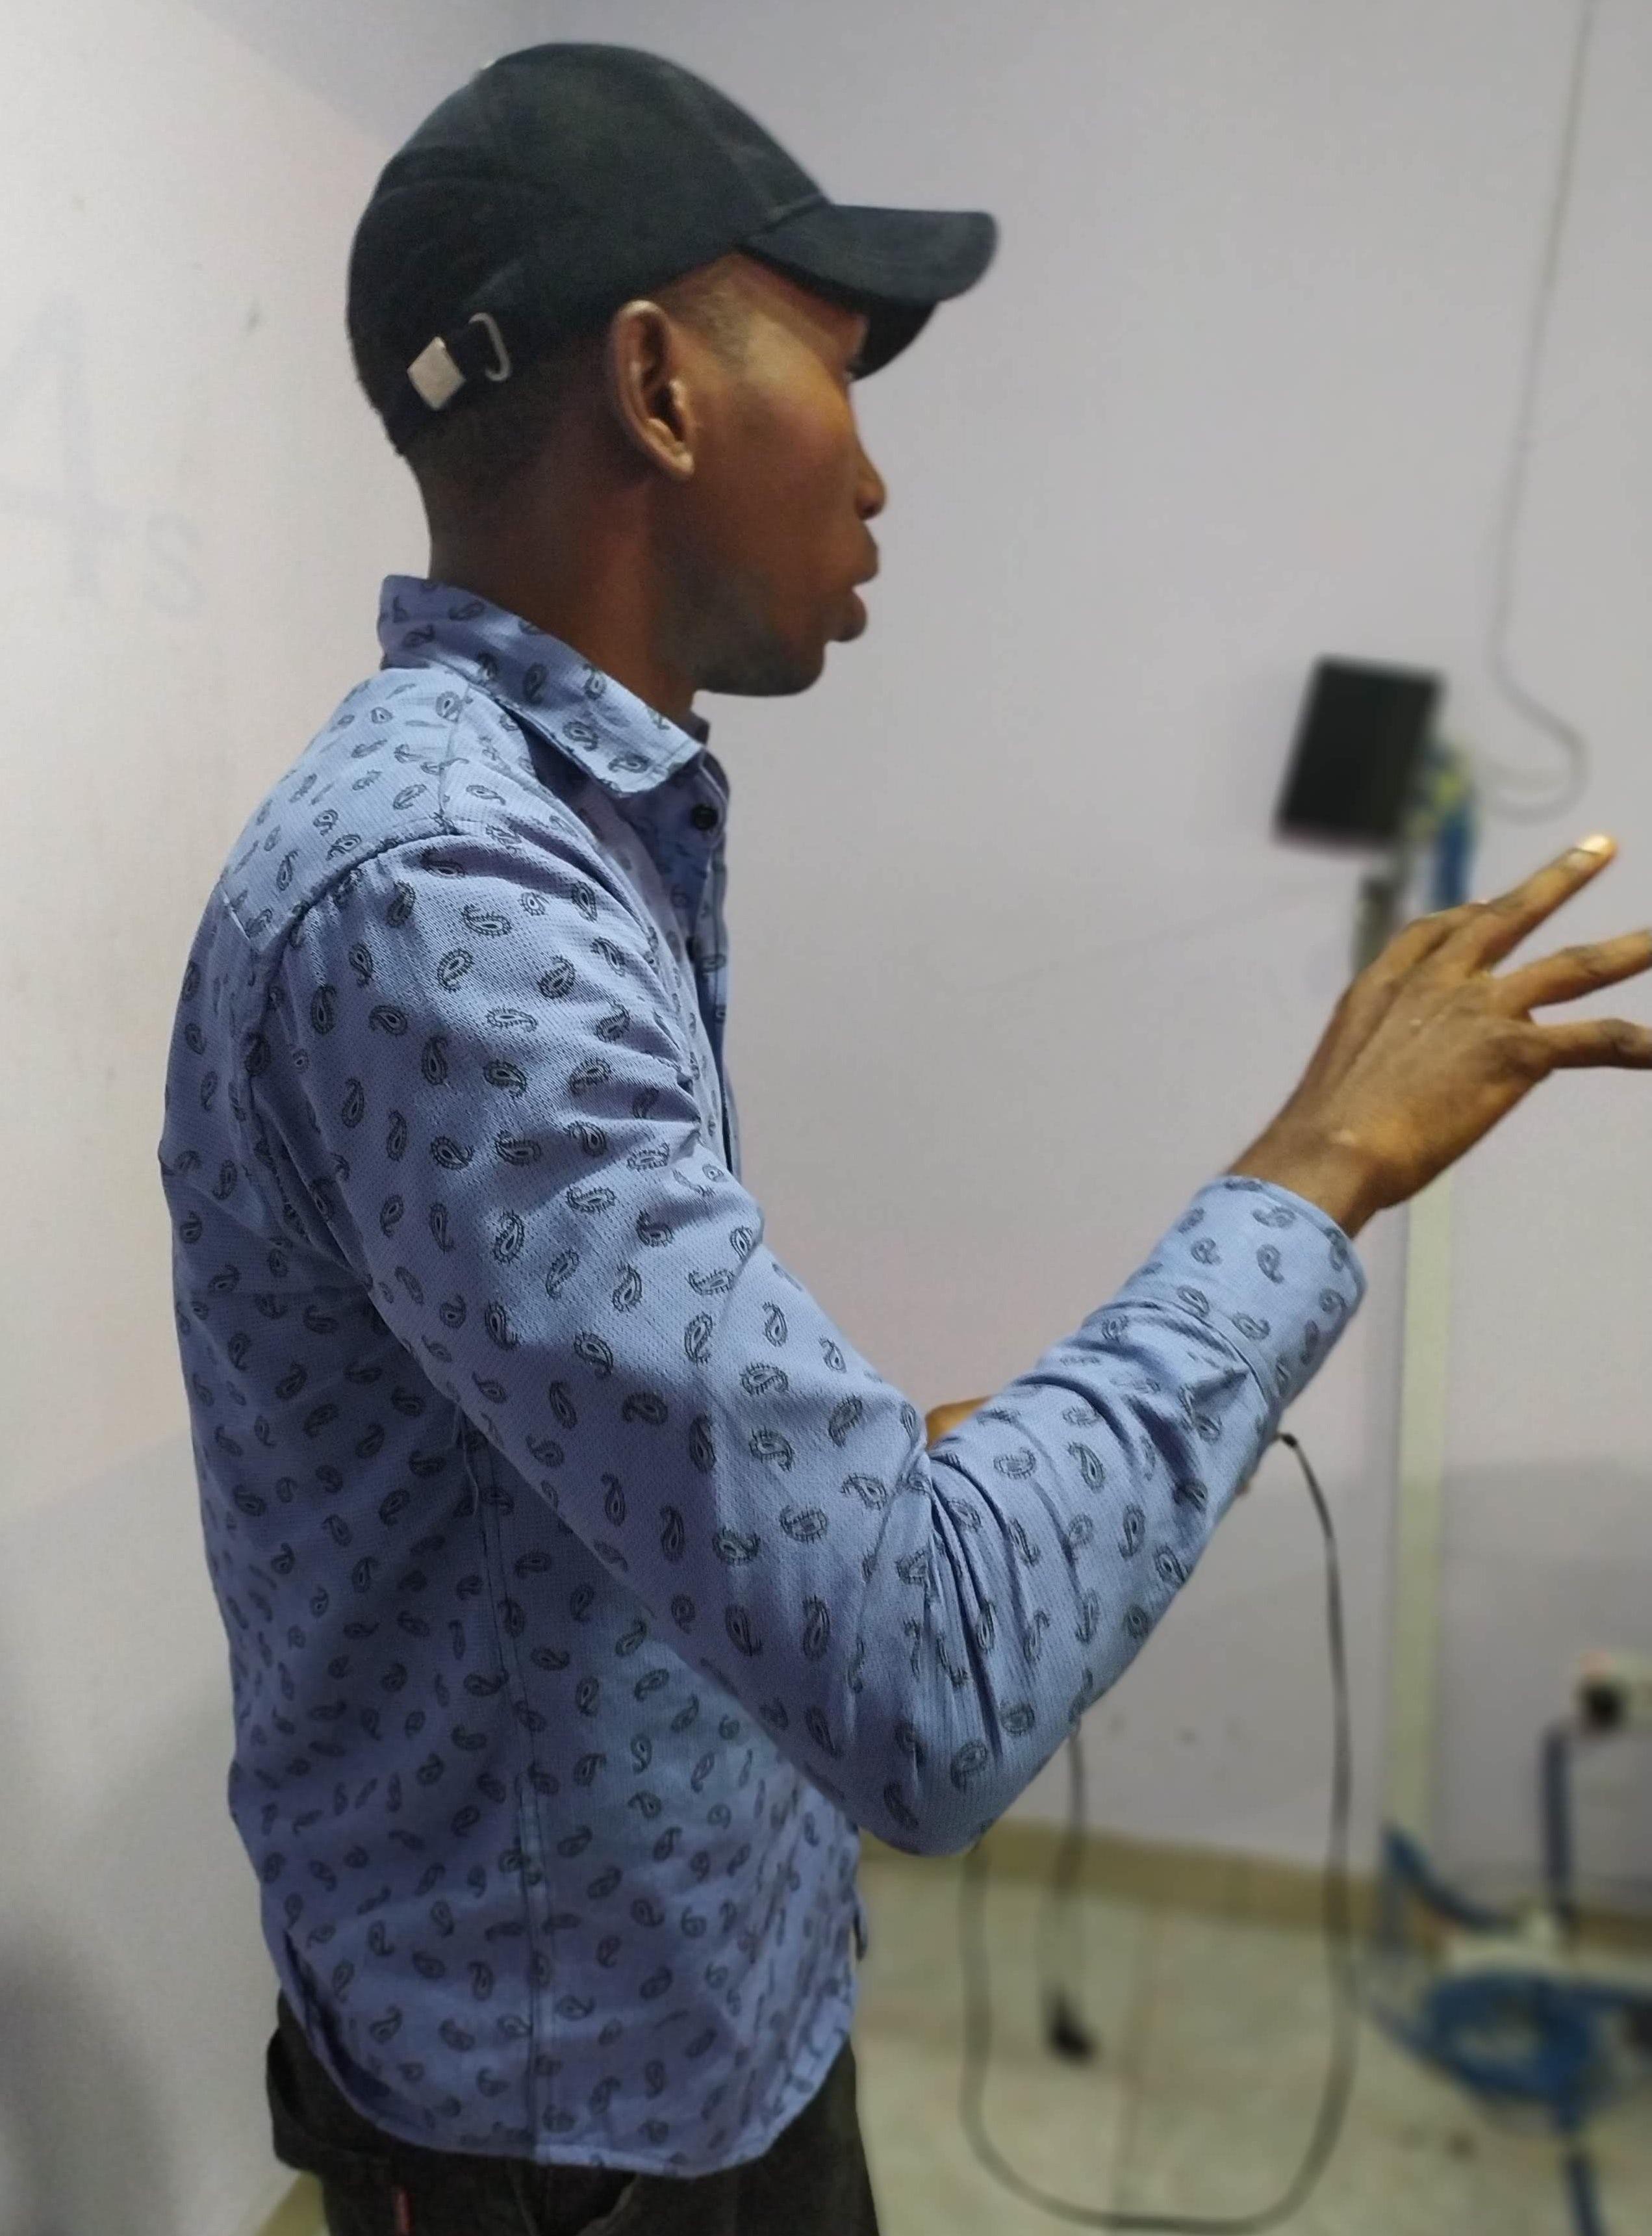 A man in blue shirt and black cap explaining a concept.jpg